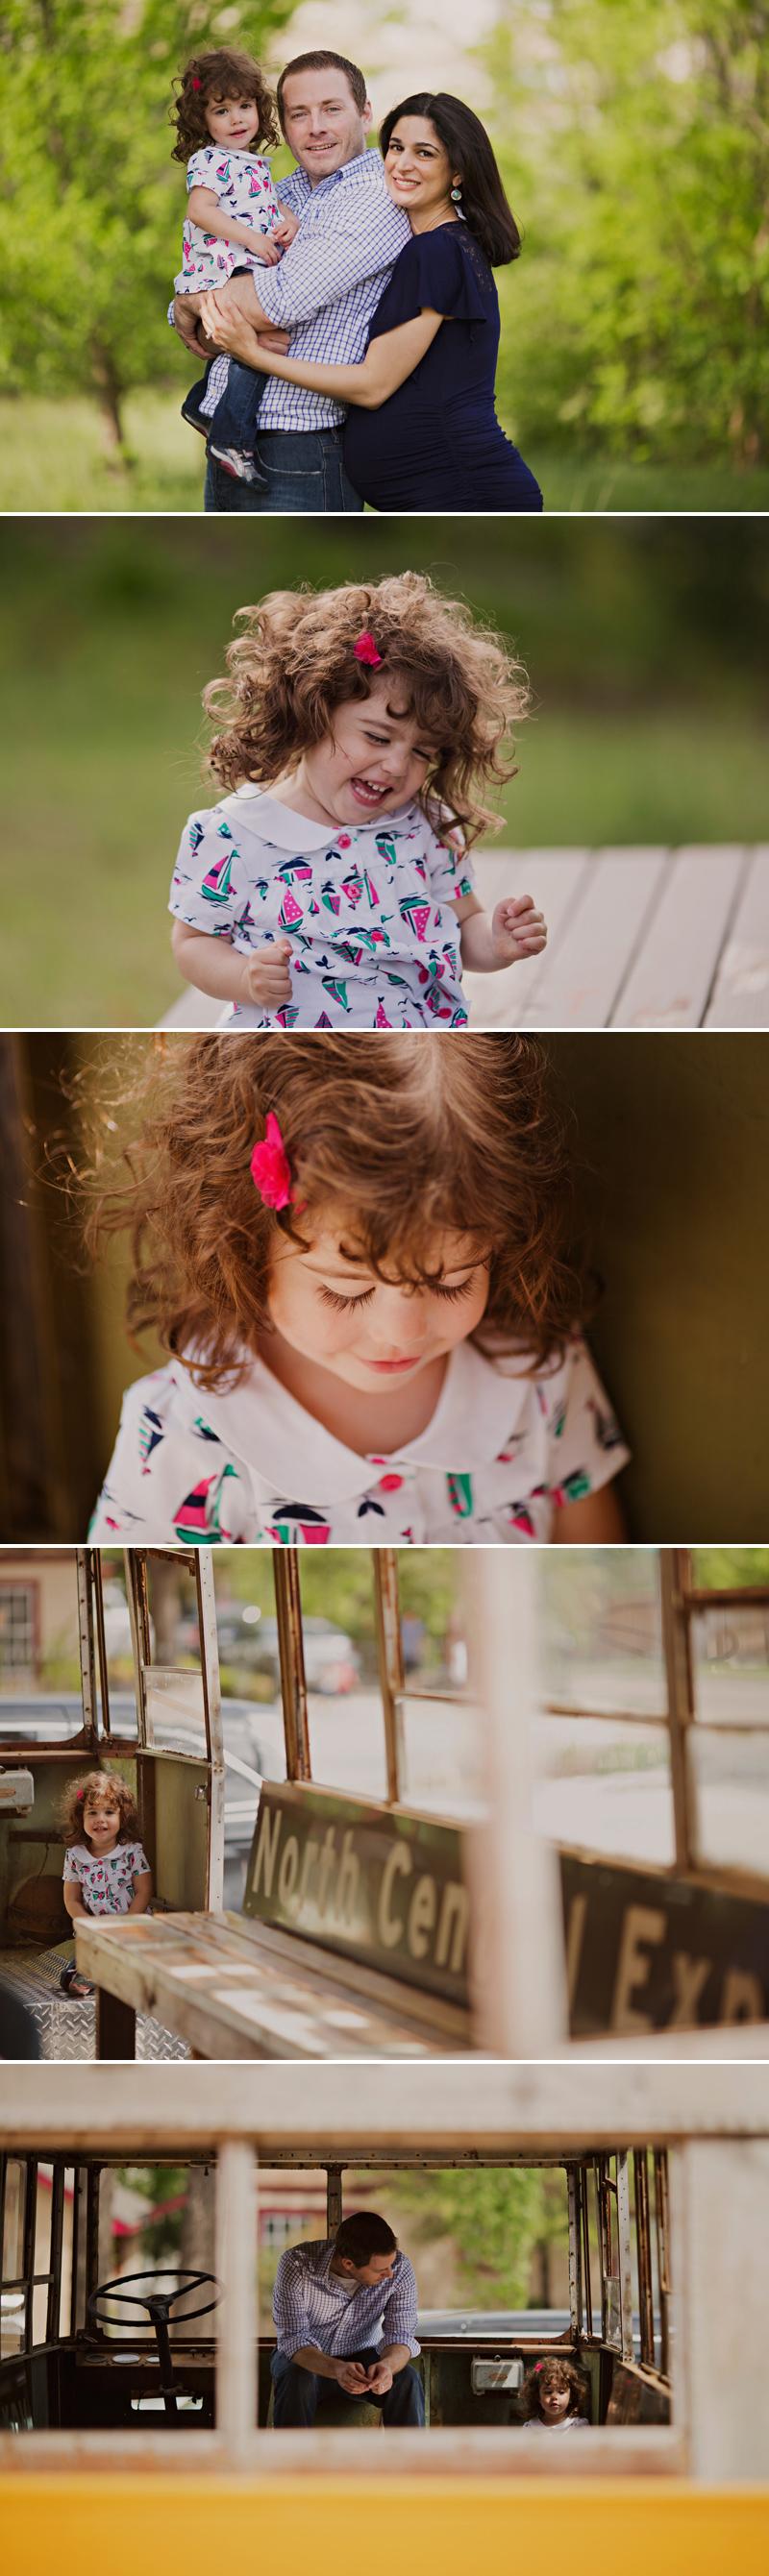 Dallas-Family-Photographercomp005